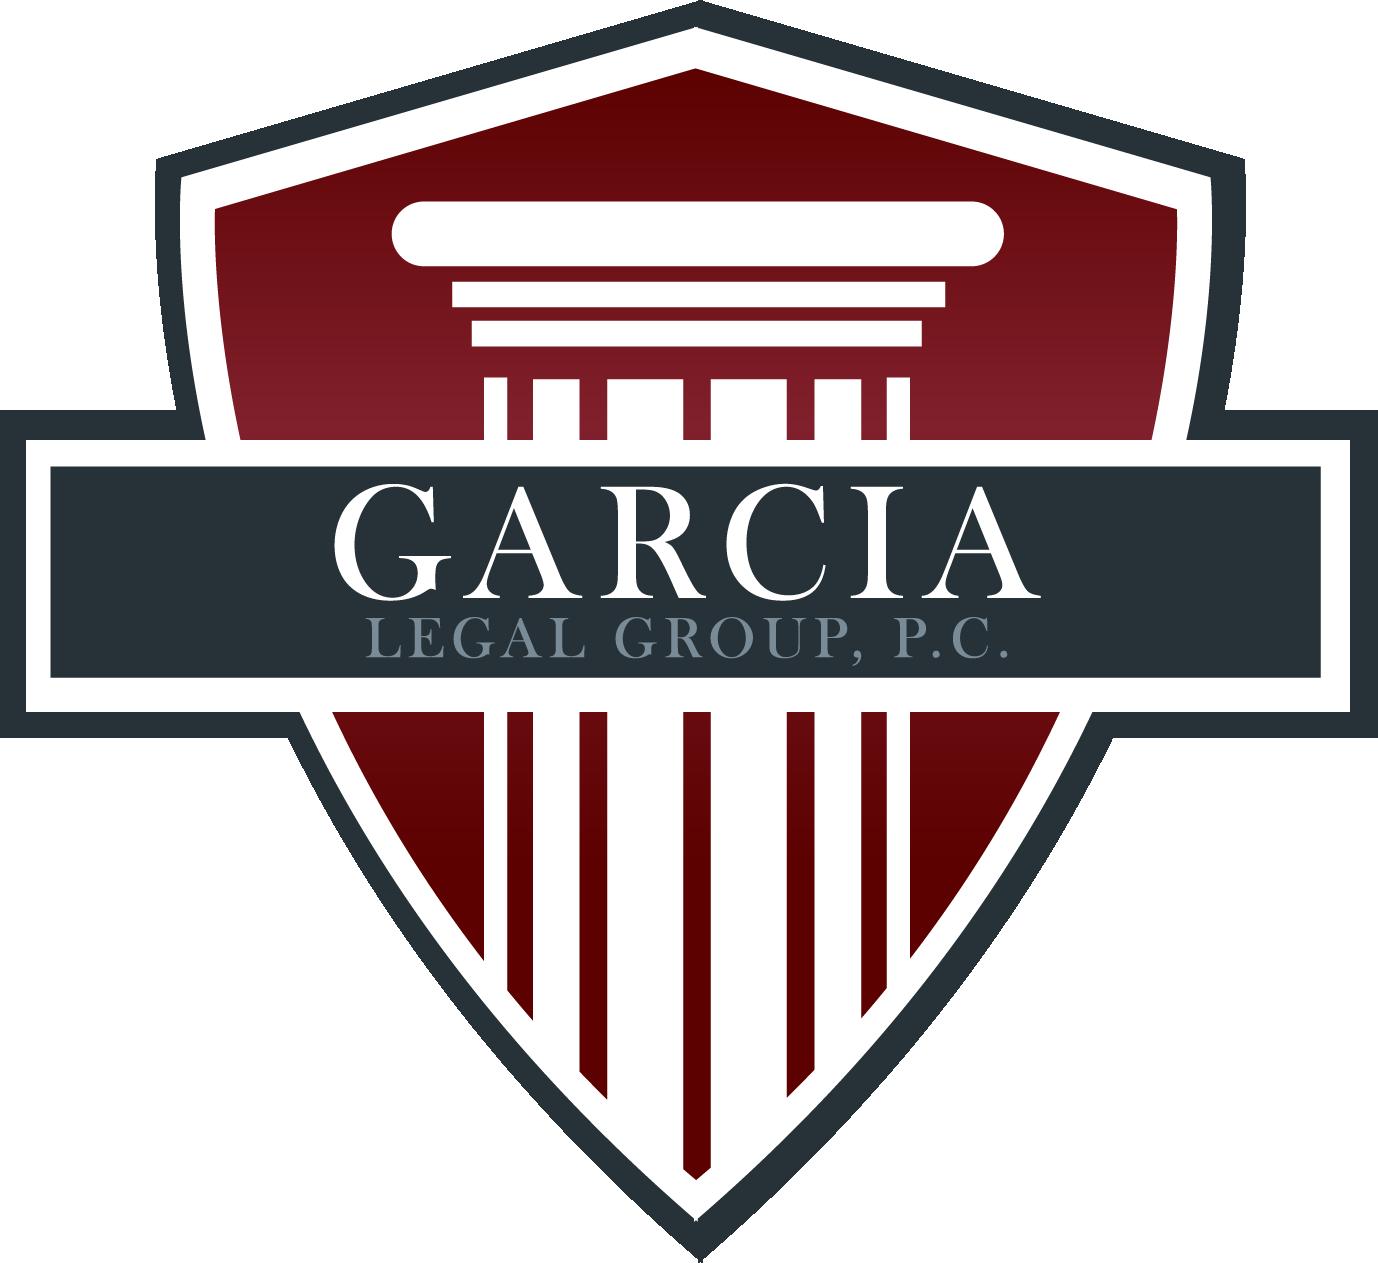 Attorney Atalia Garcia